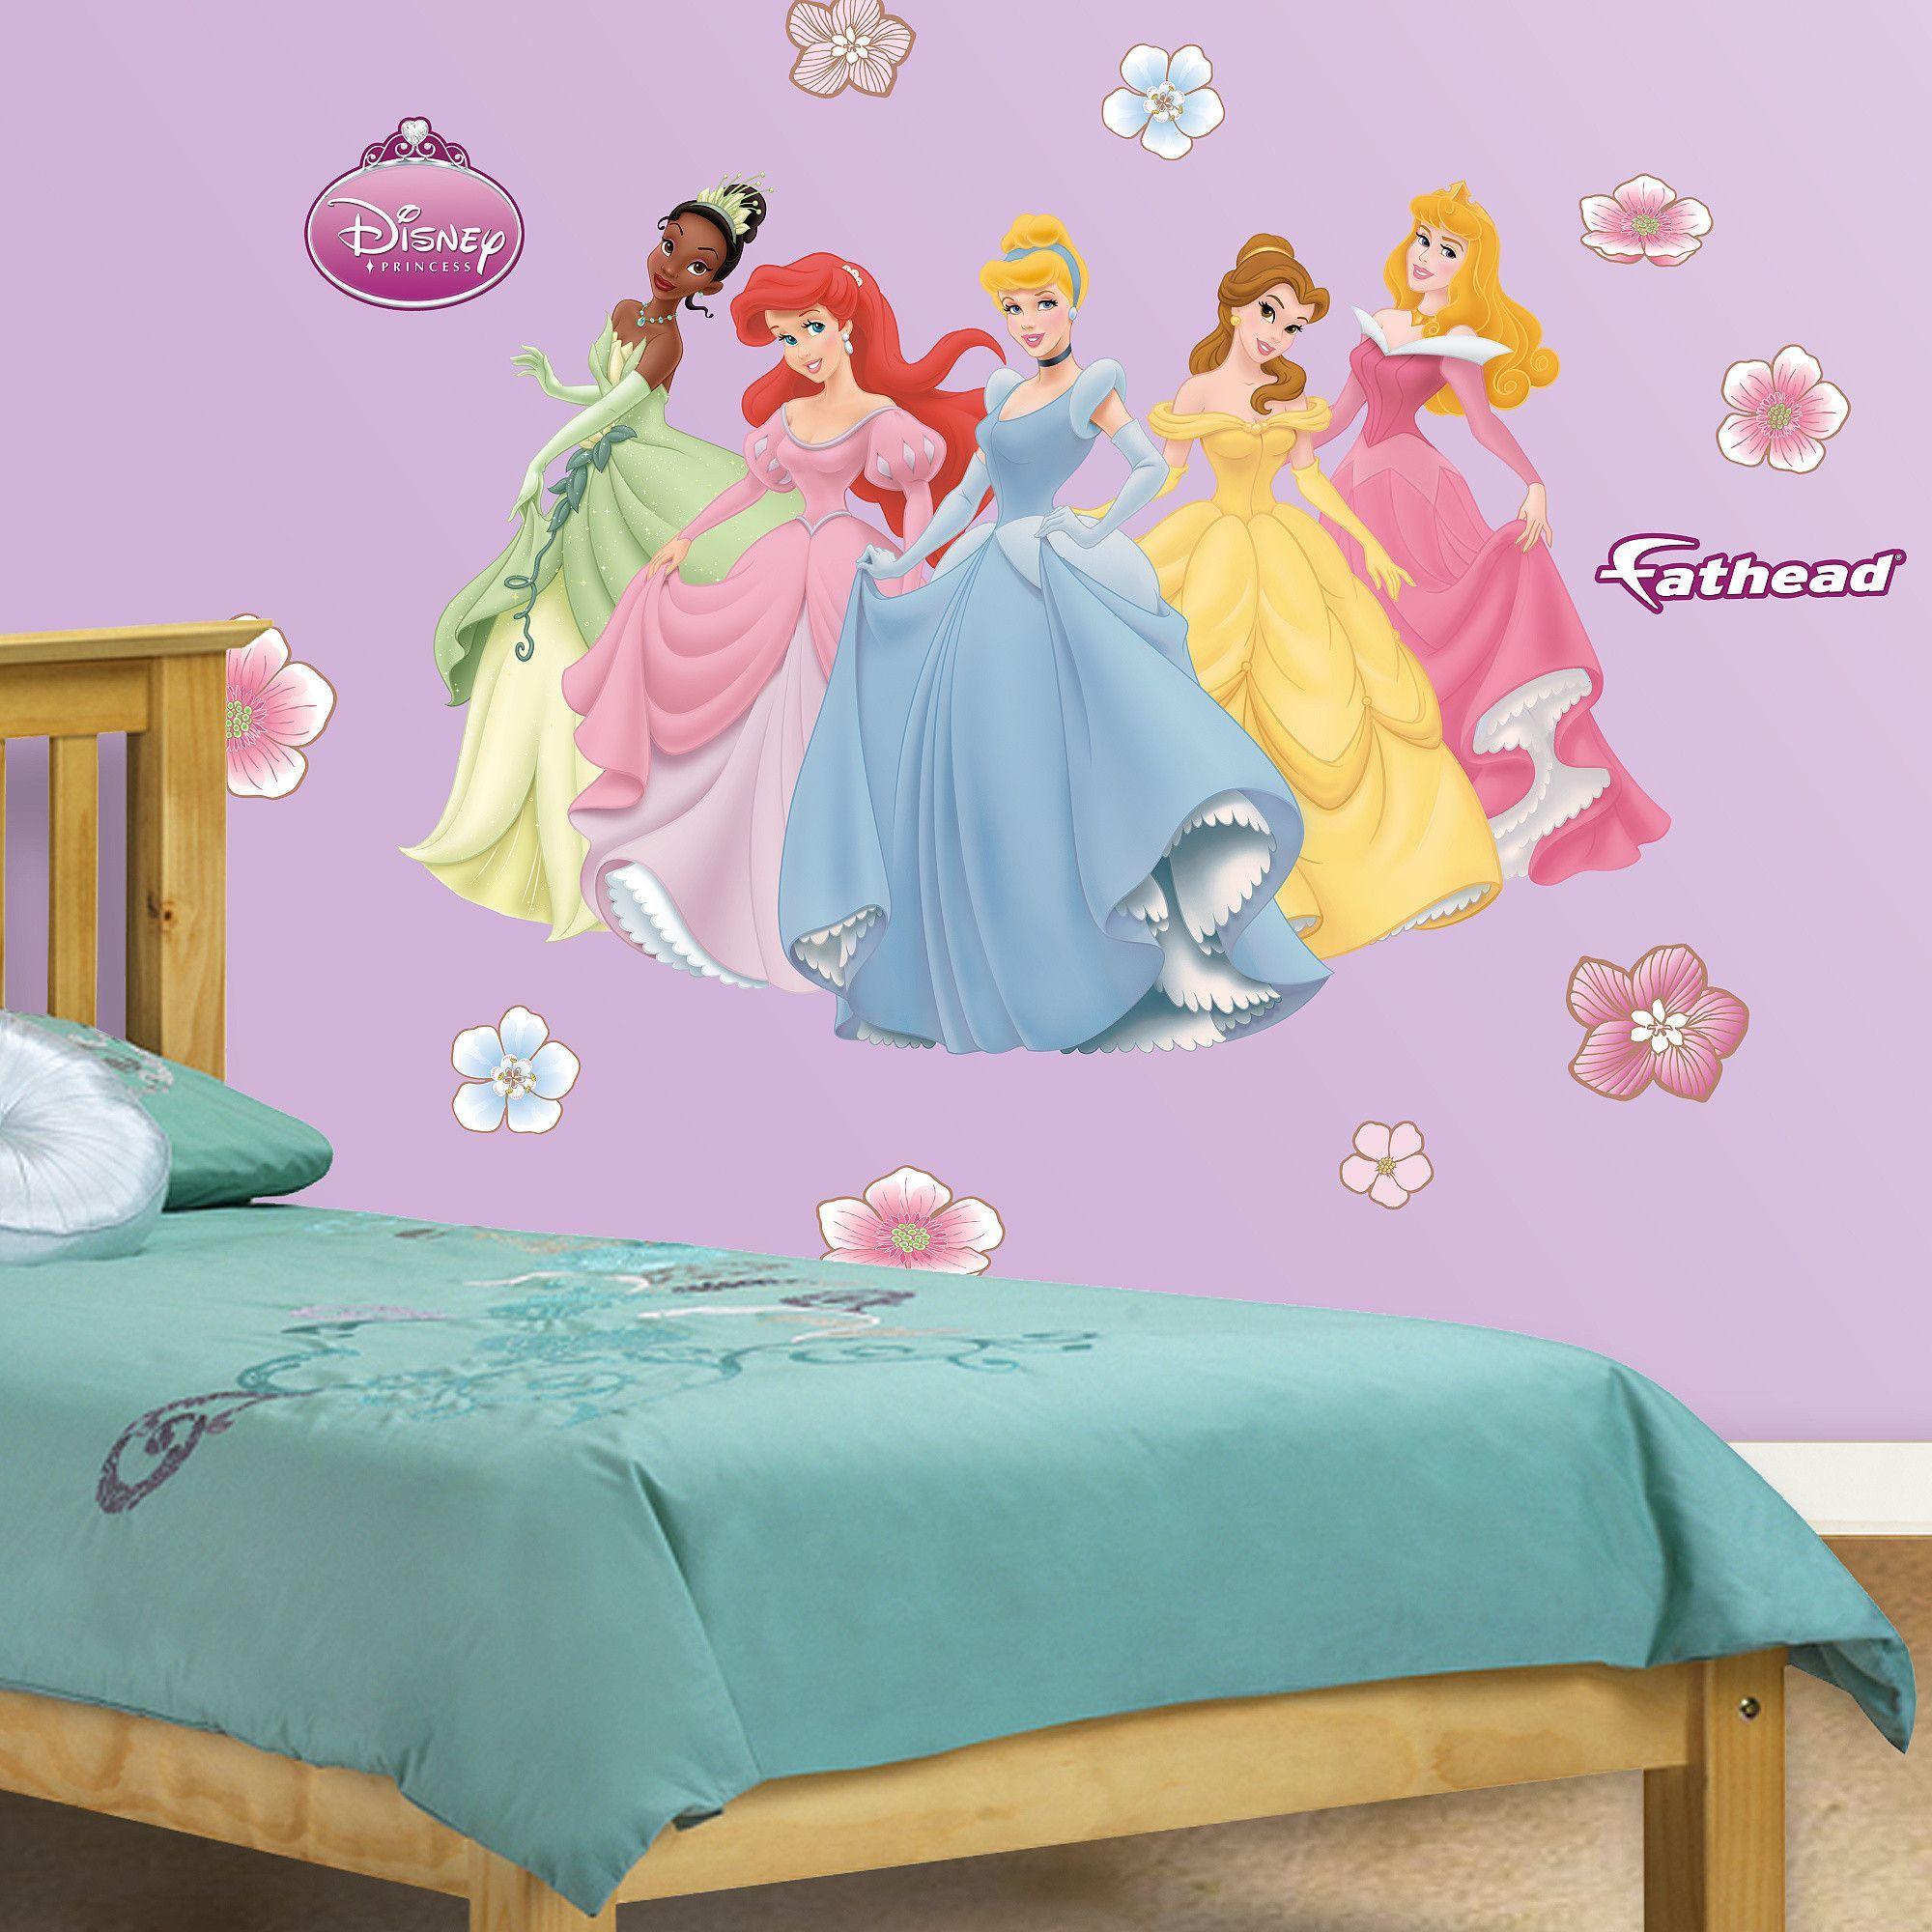 Disney Princesses Wall Decal